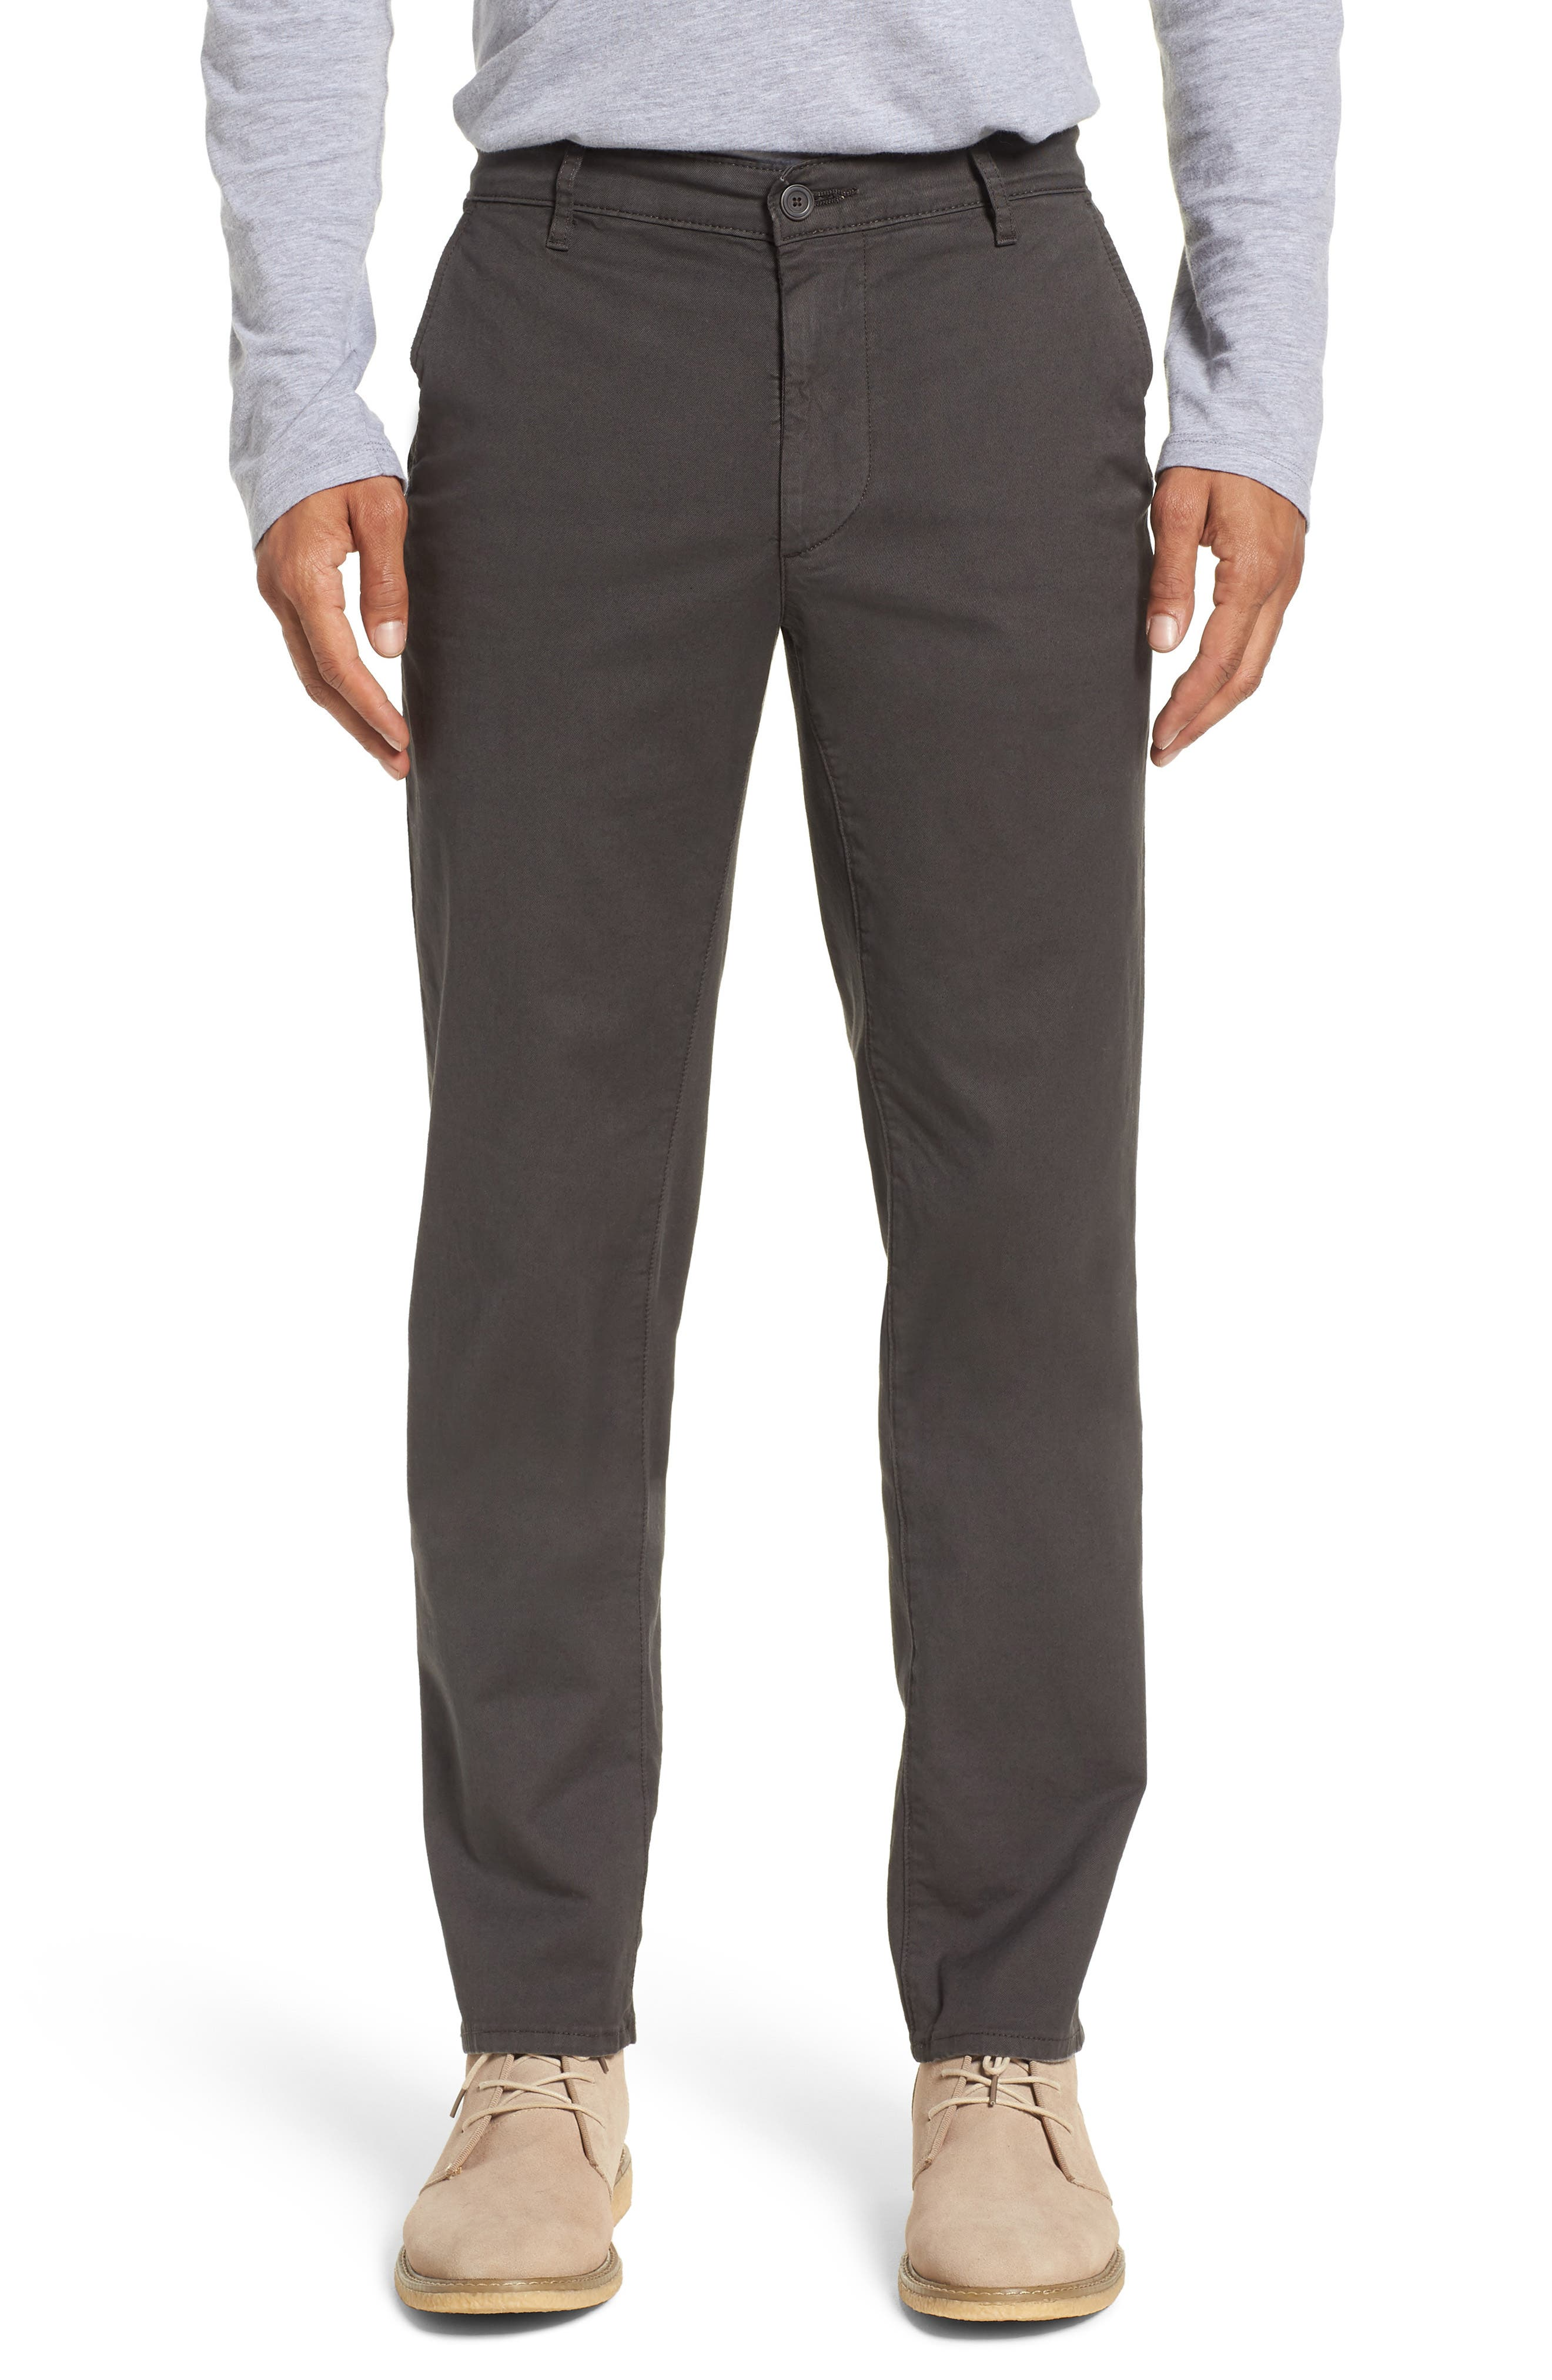 Alternate Image 1 Selected - AG Marshall Slim Straight Leg Chino Pants